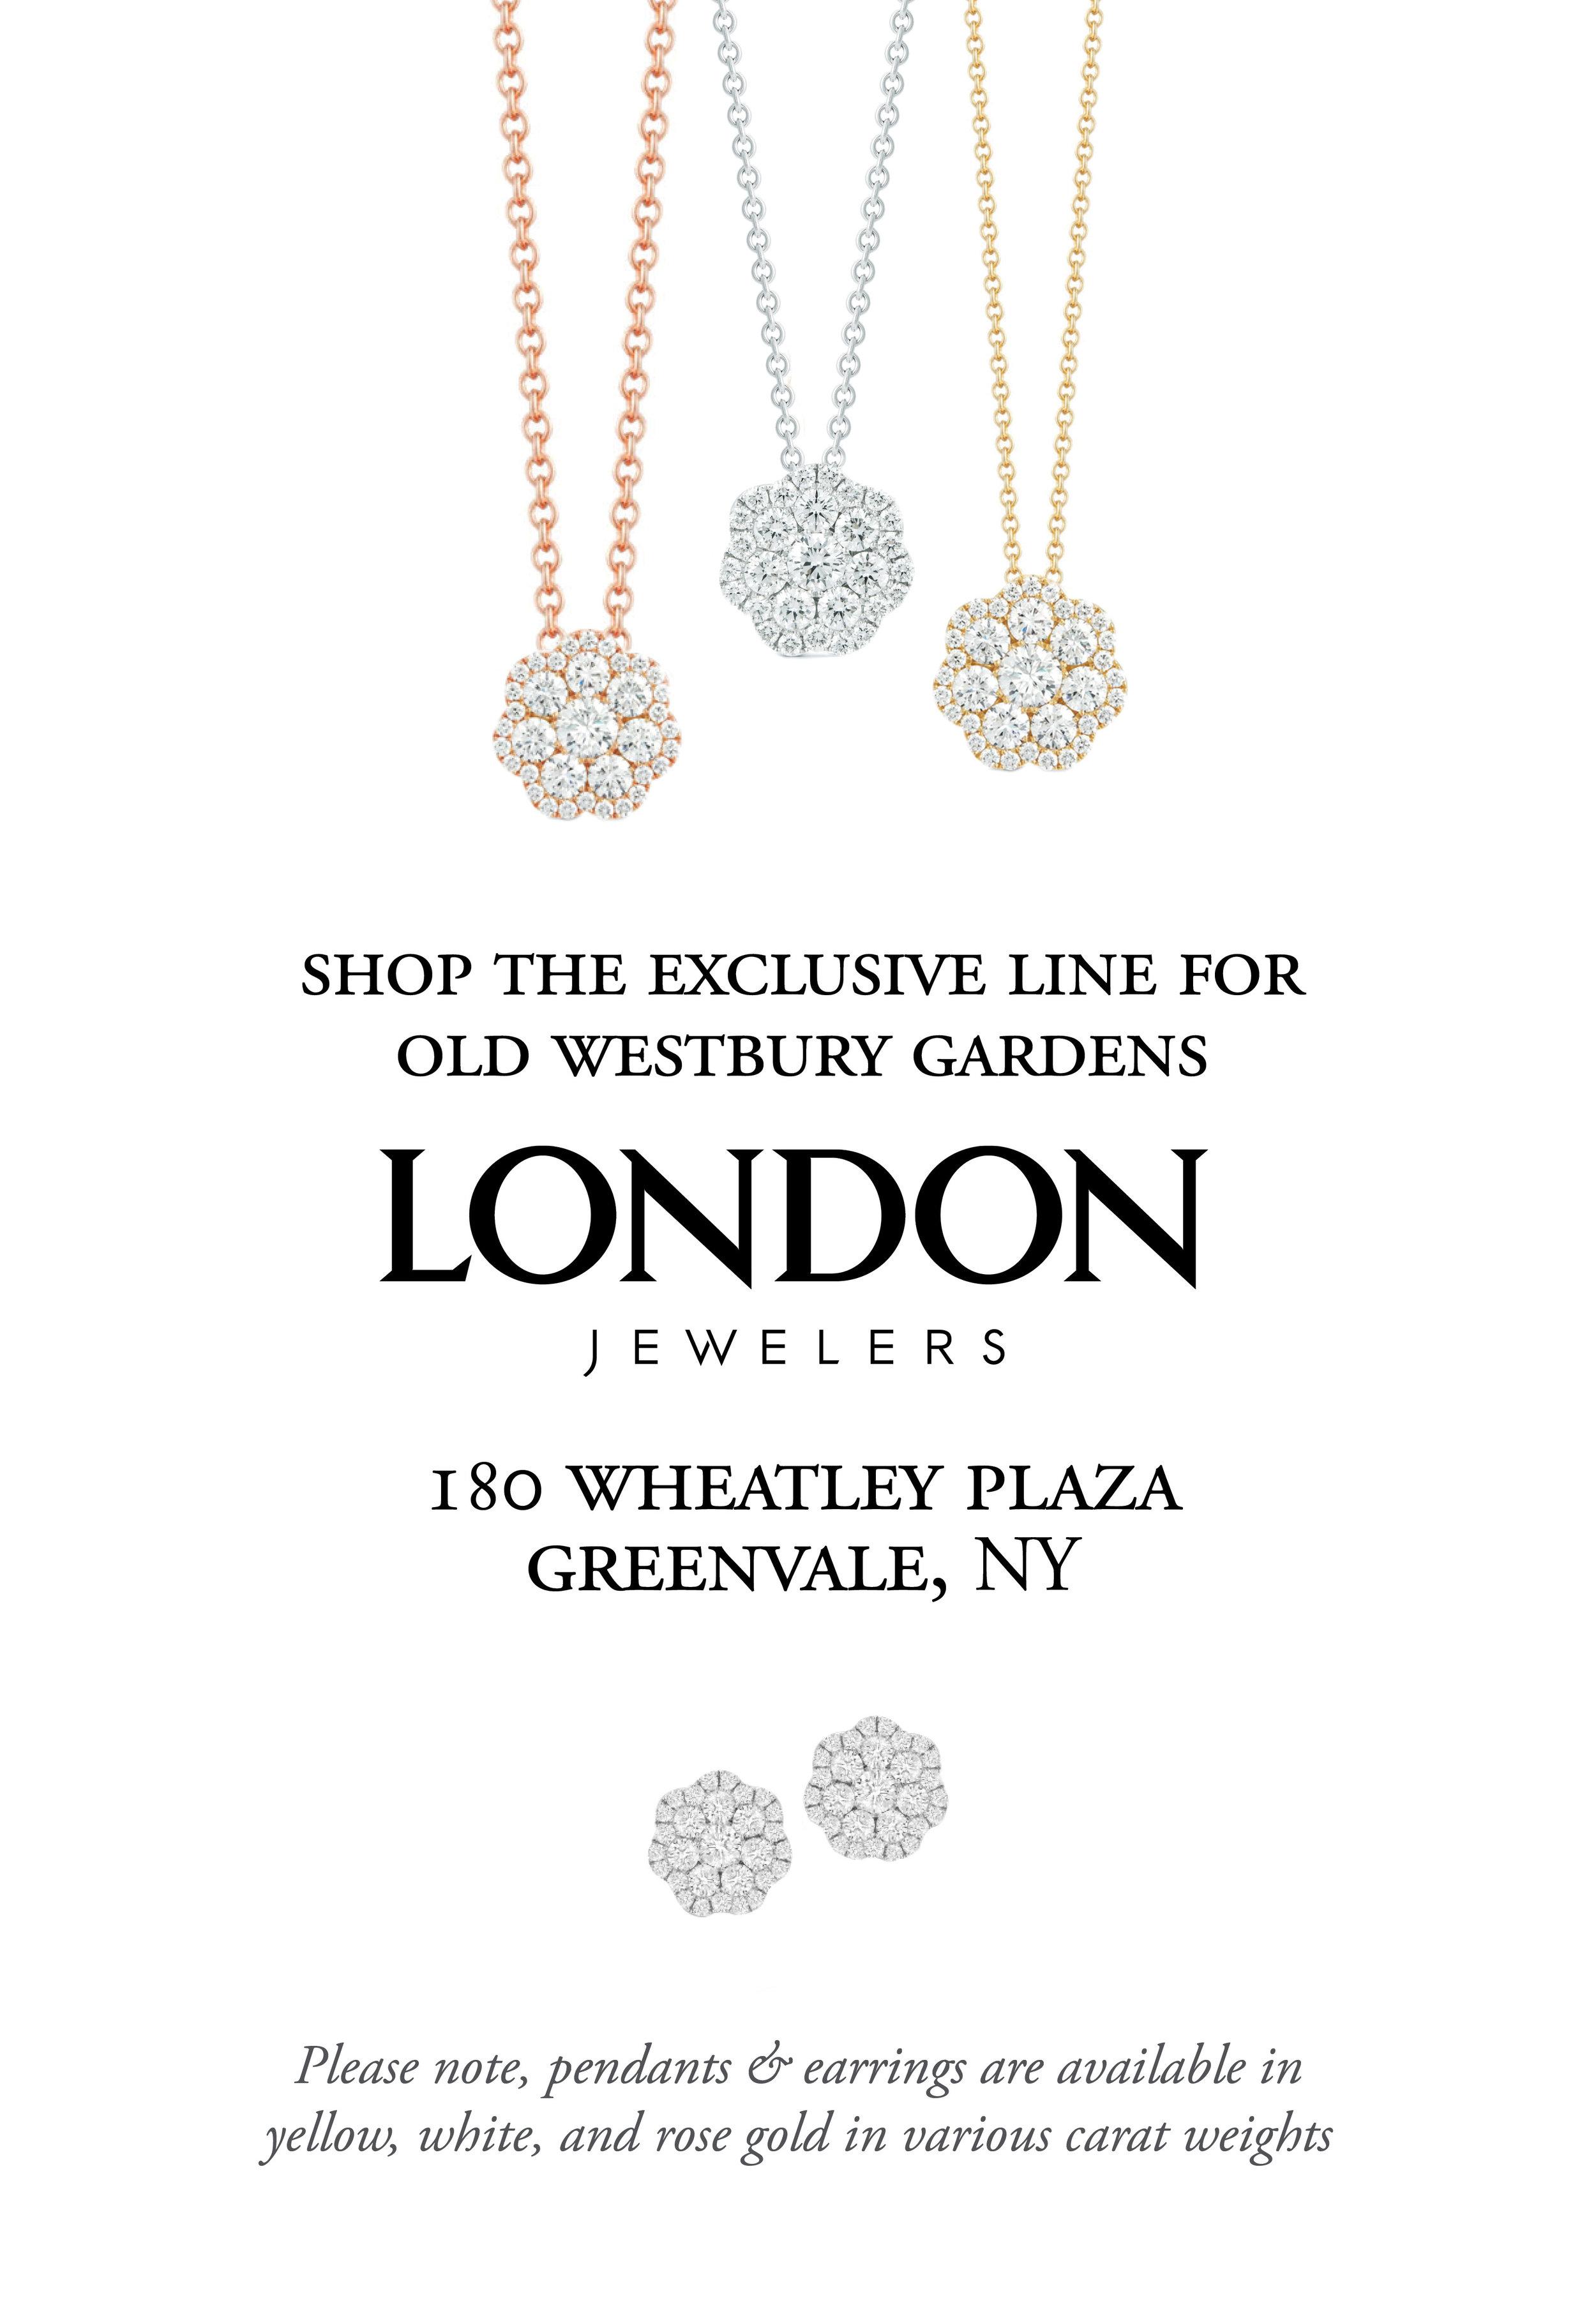 CIB London Jewelers Party Invite web2.jpg